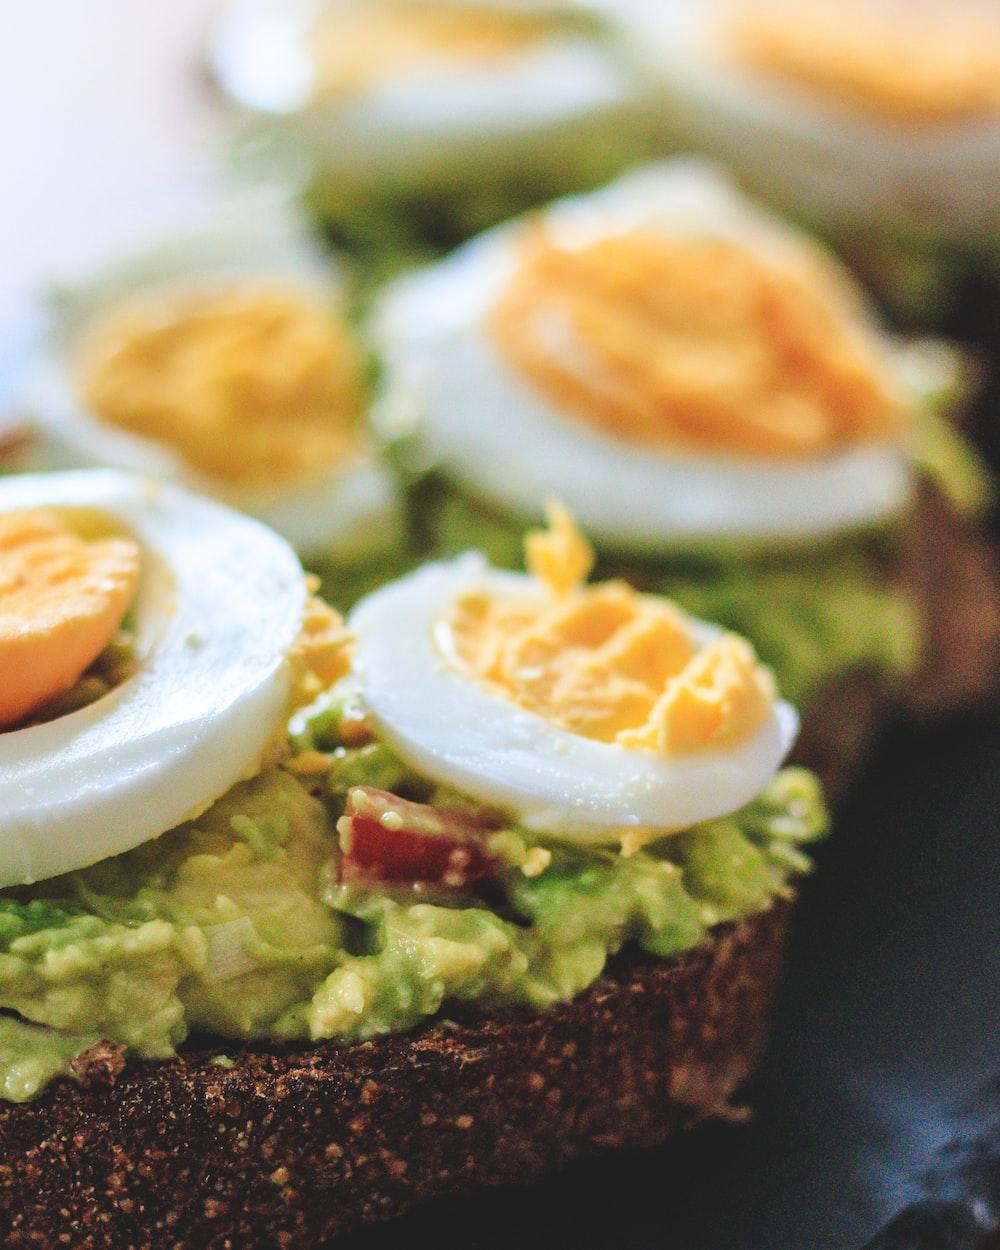 sunny side up egg on brown bread